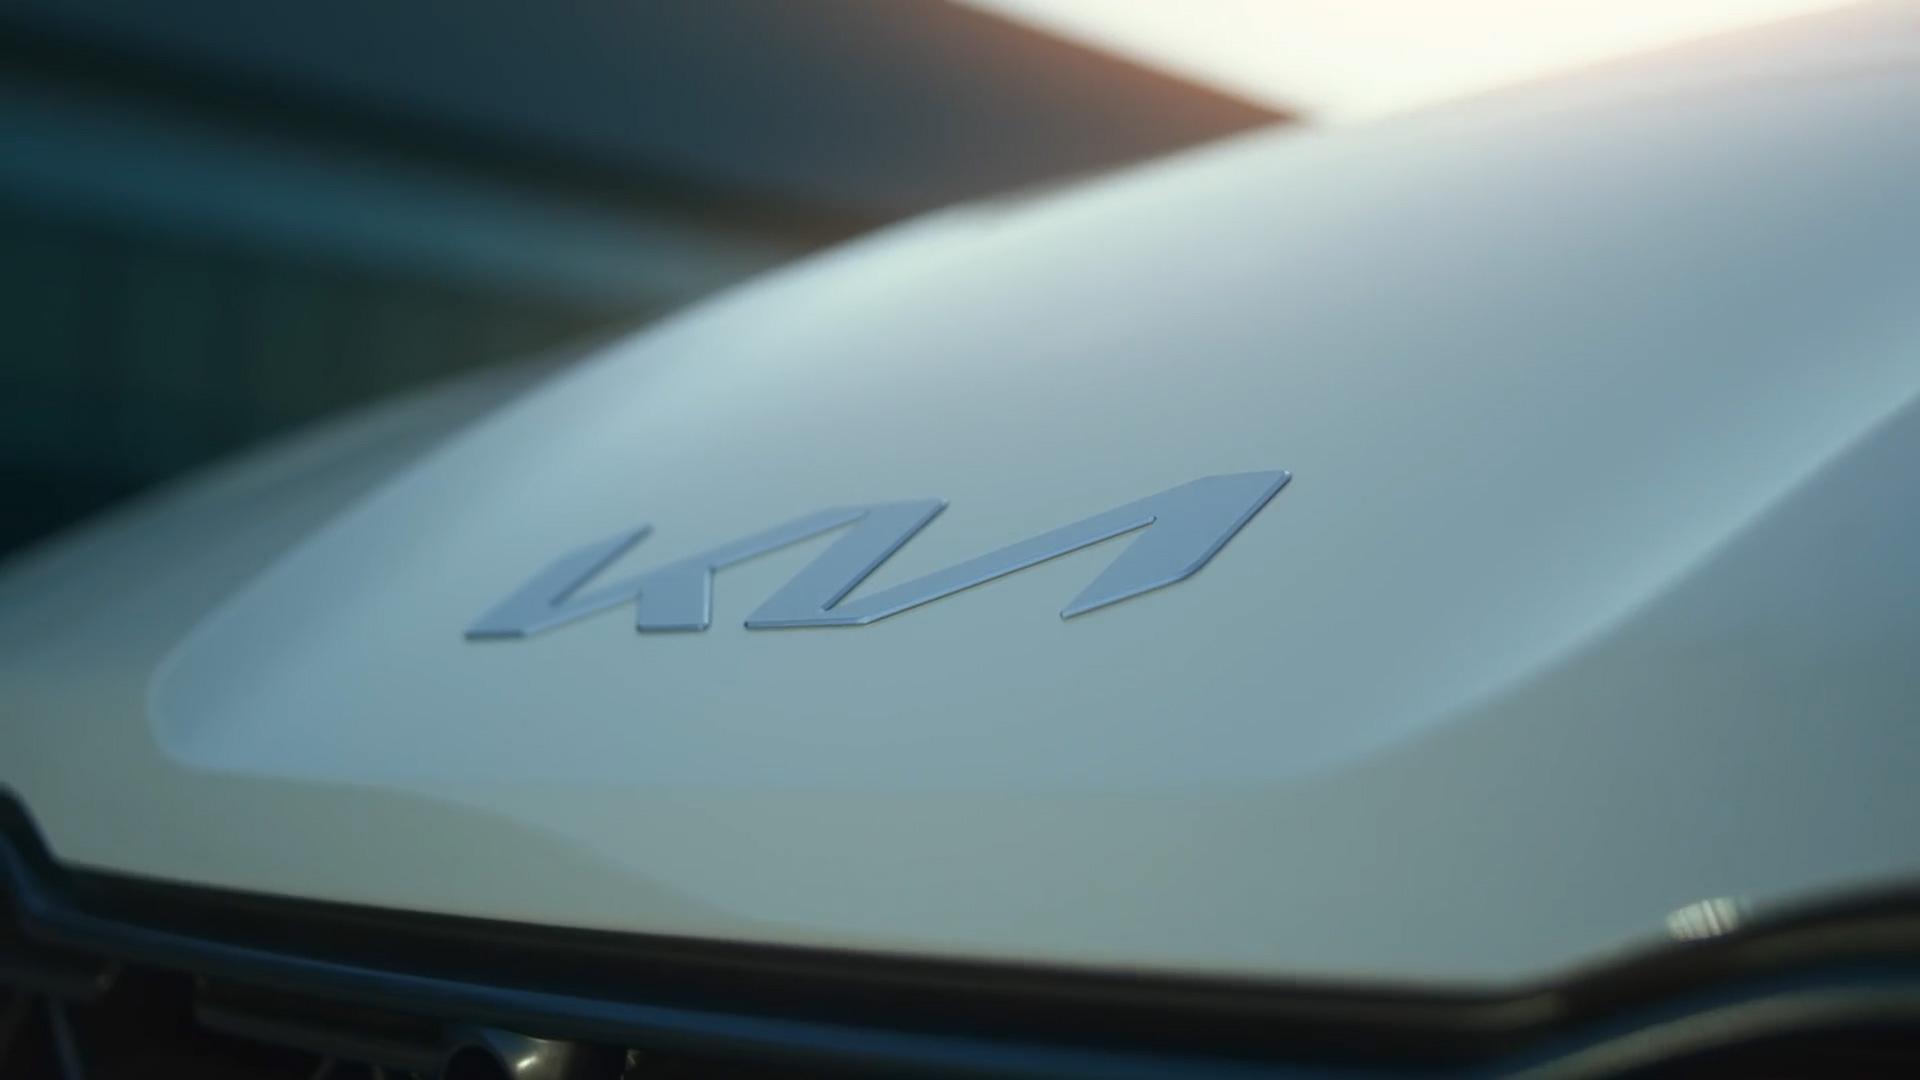 Auto brands trend: KIA rebrand emblem